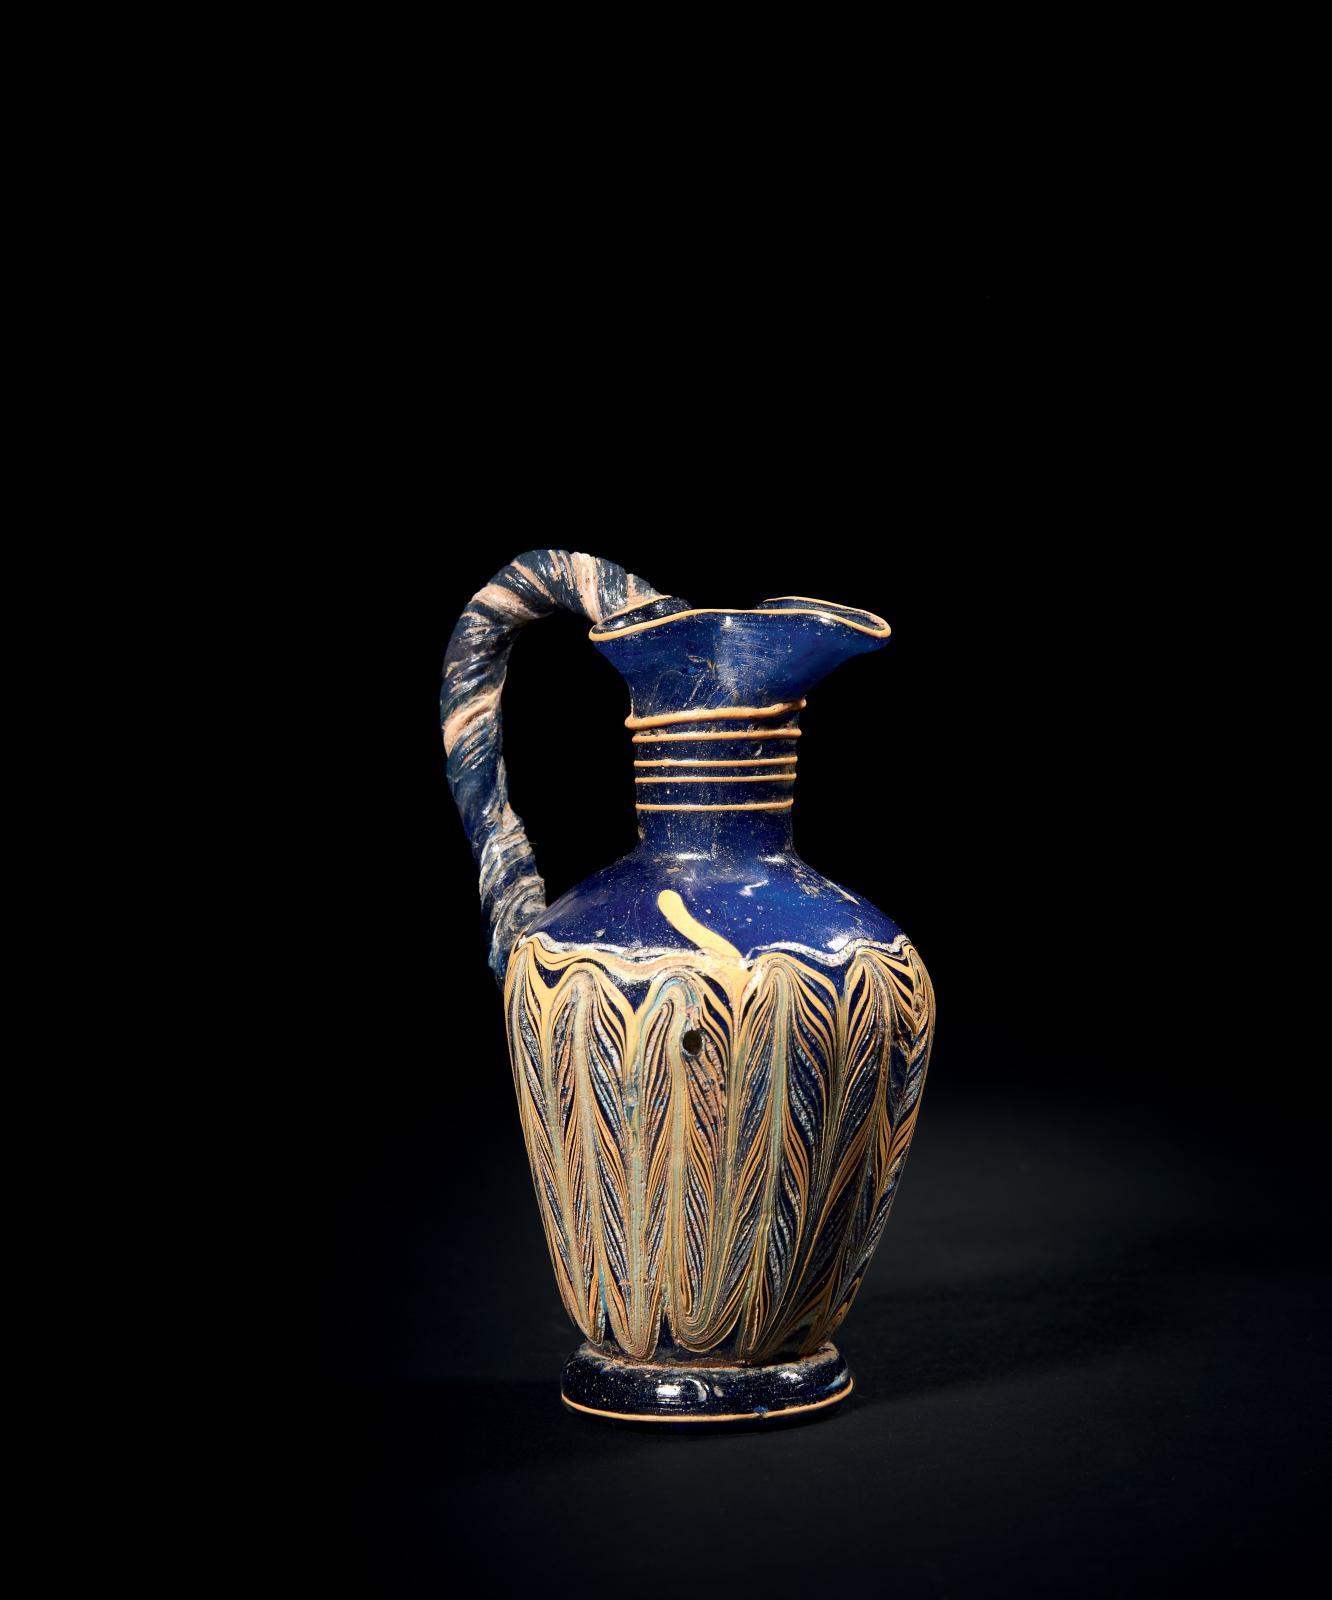 Méditerranée orientale, milieu du IVe-fin du IIIesiècle av. J.-C. Oenochoé en verre sur noyau, type Harden, groupe2, forme7, embouchure tréflée, an